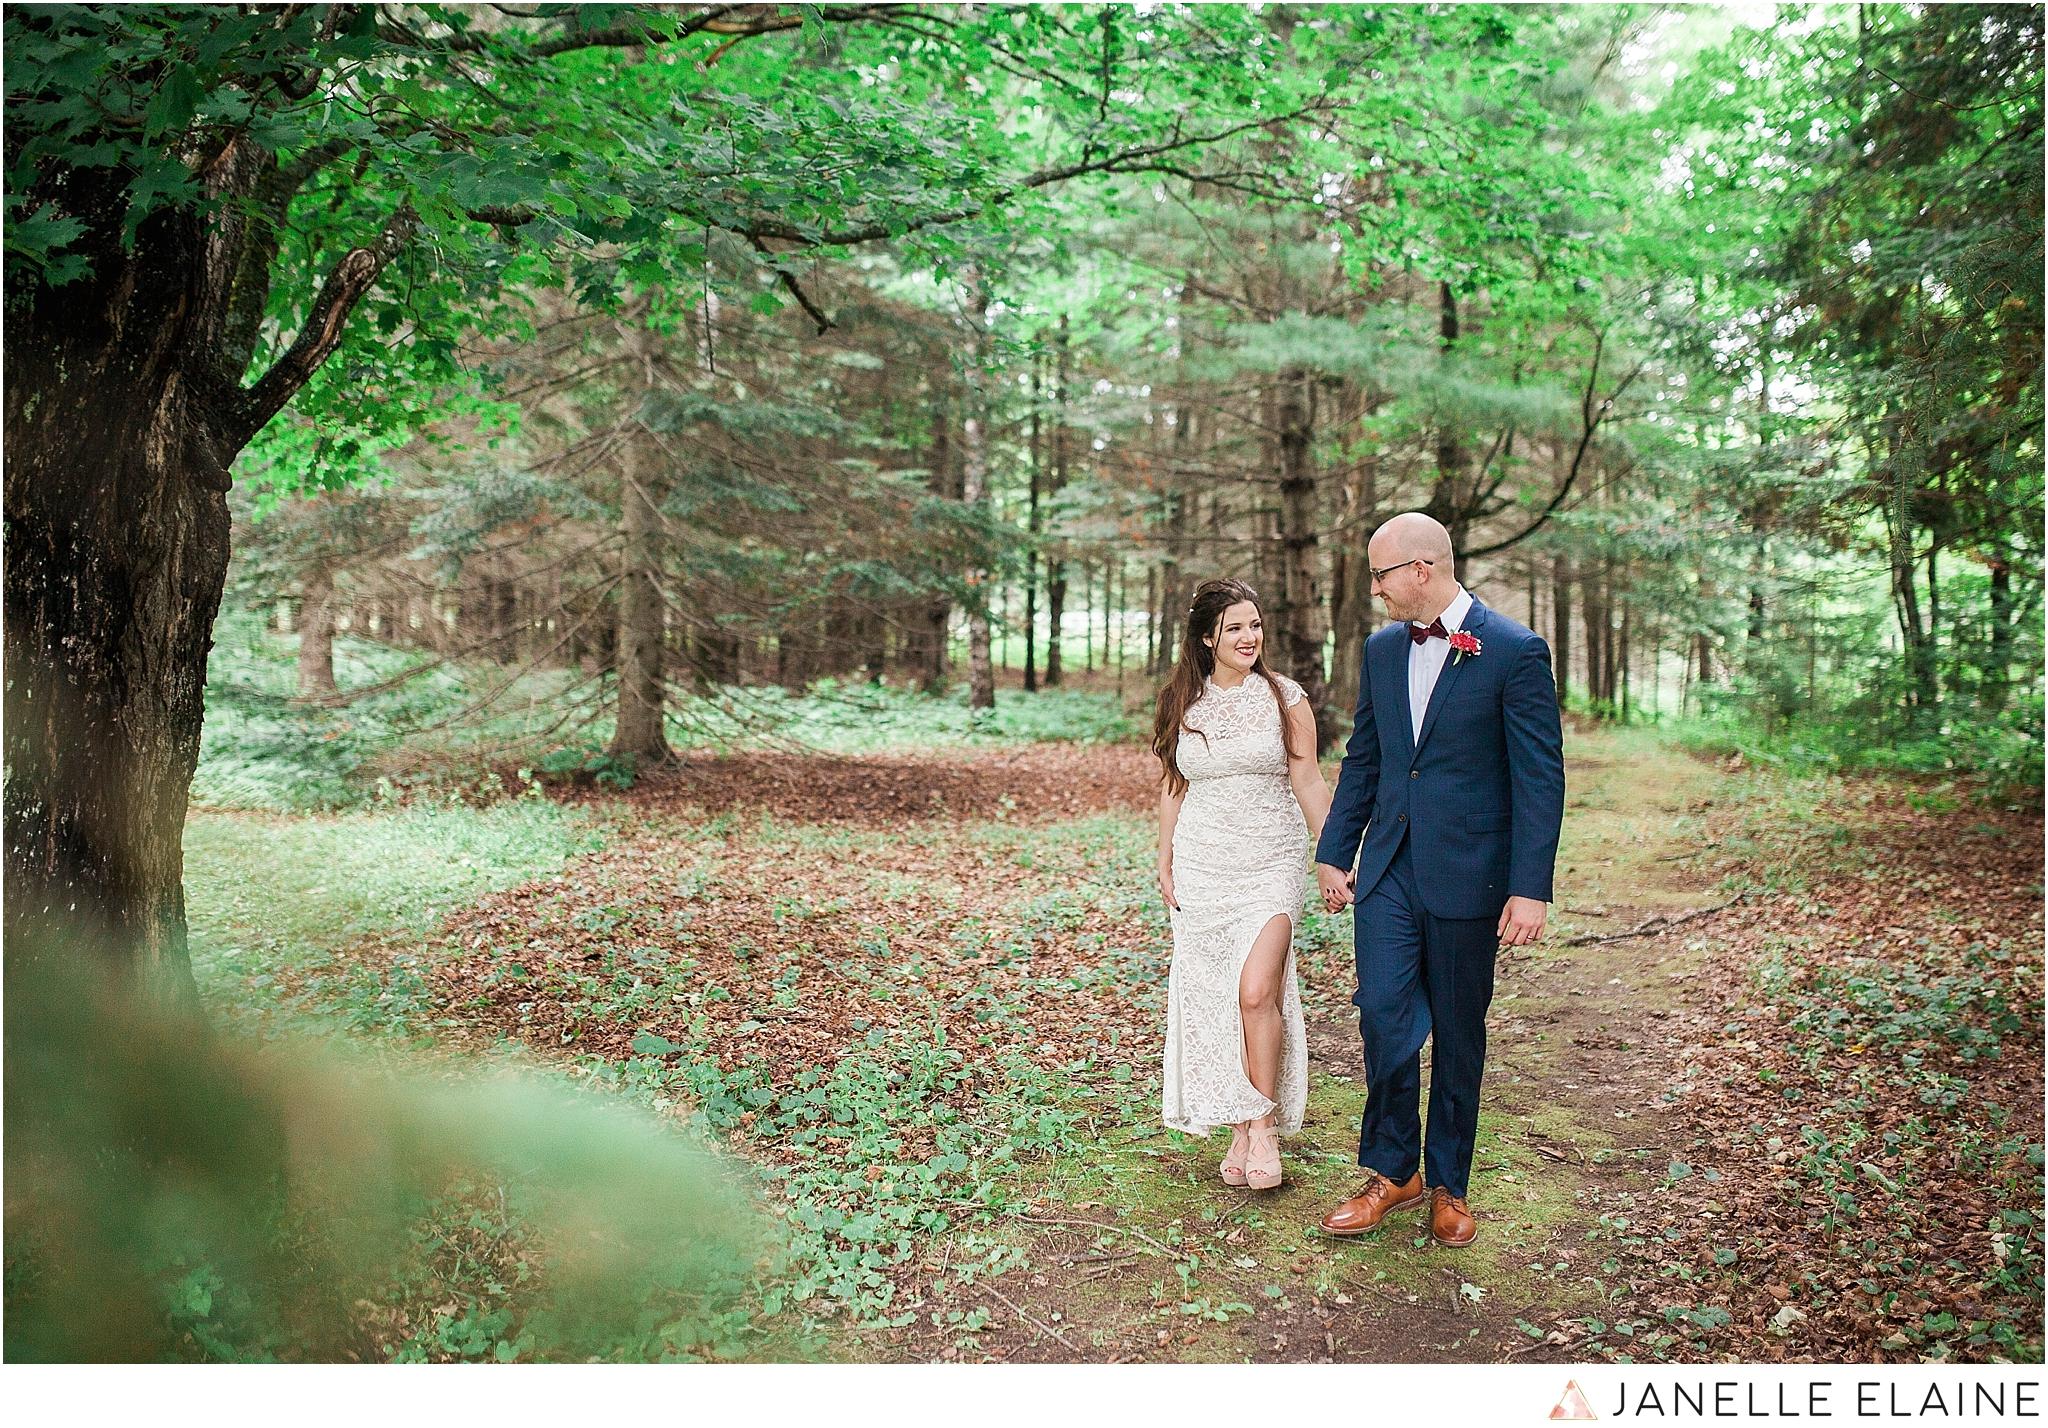 janelle elaine photography-seattle-destination-wedding-photographer-98.jpg